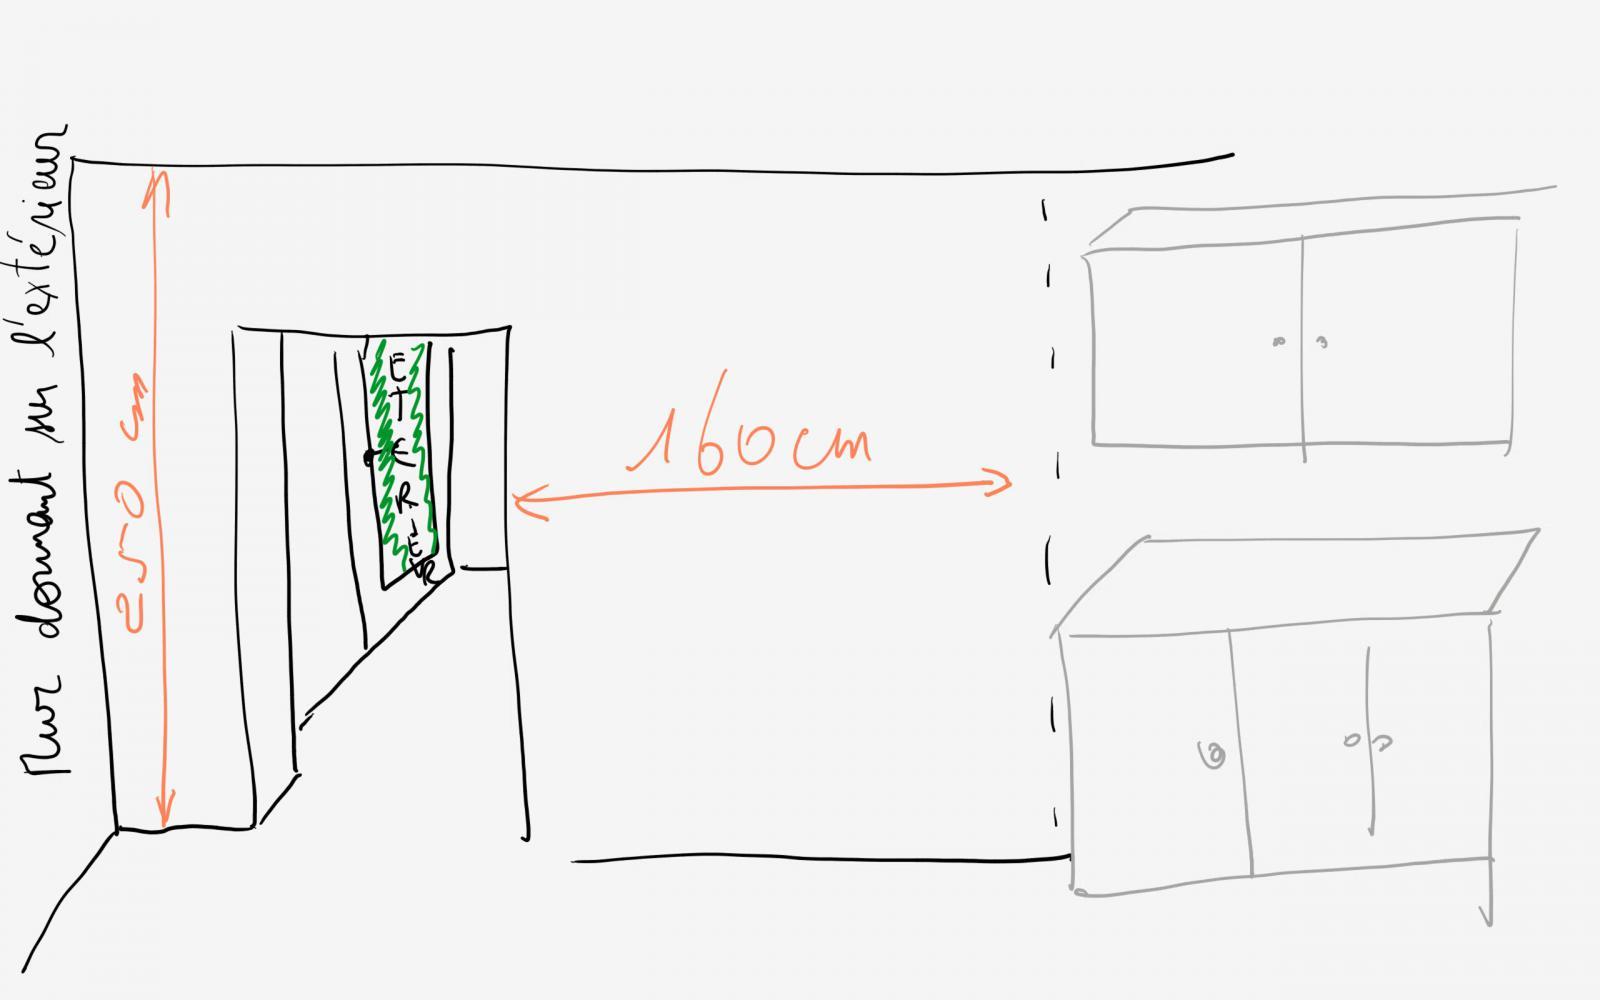 pos d 39 un ipn et co t. Black Bedroom Furniture Sets. Home Design Ideas